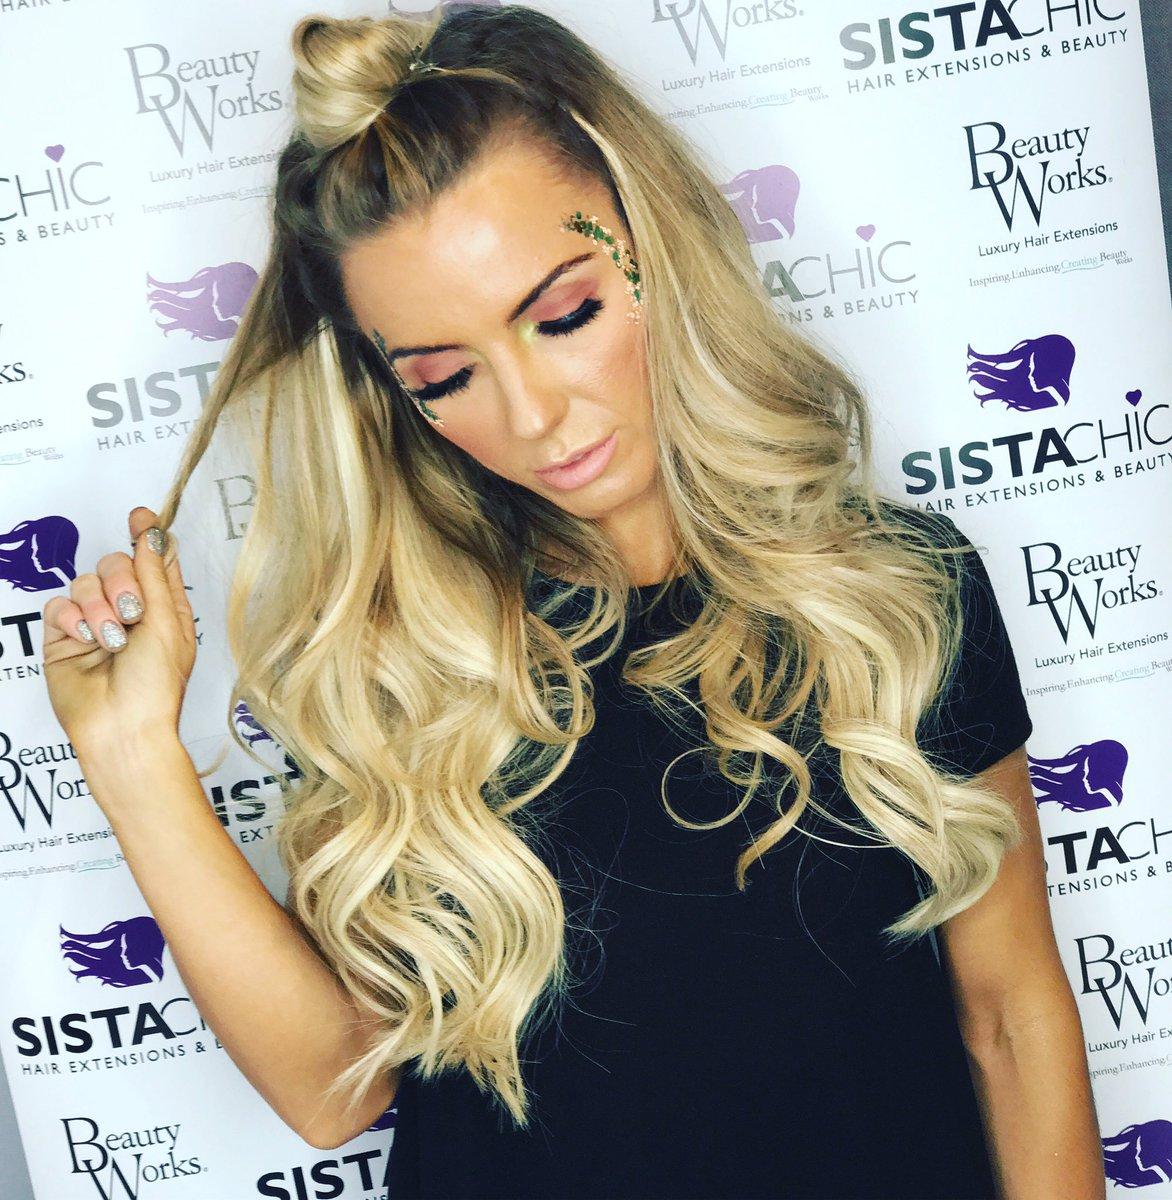 Sistachic On Twitter Makeover Beautyworks Hair Sheffield